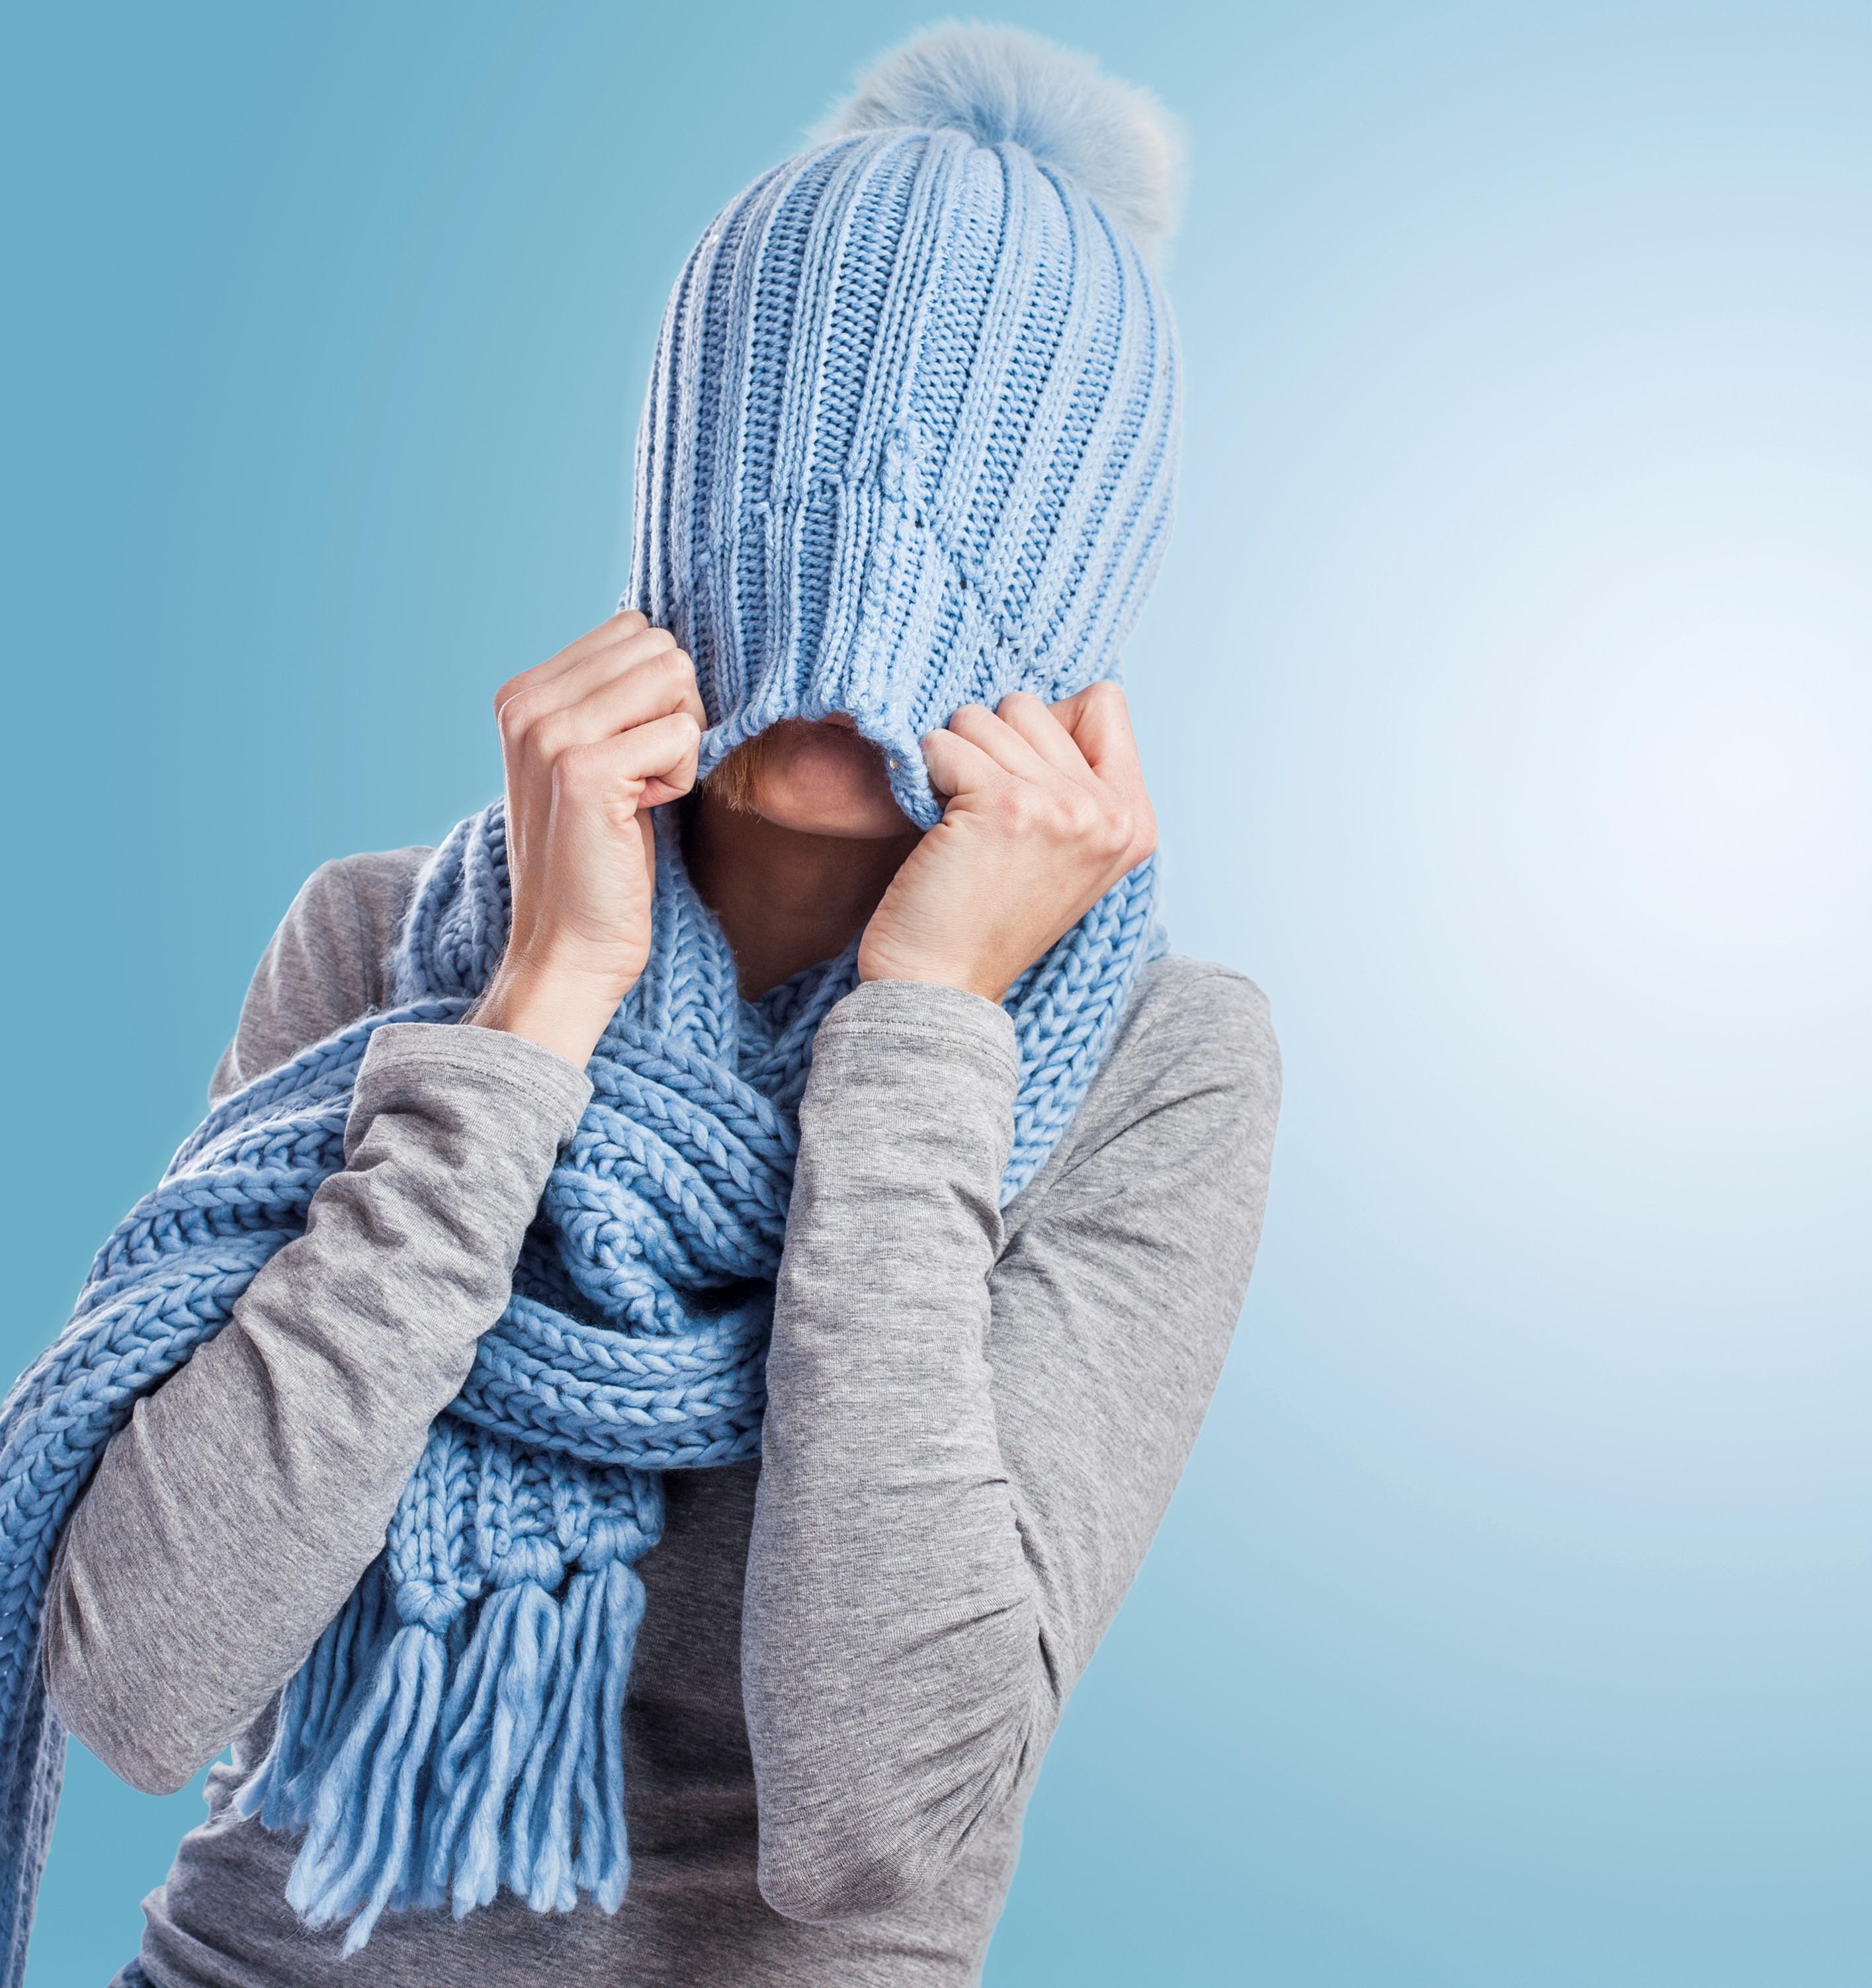 15 Tips For Avoiding Eczema Flares in Winter